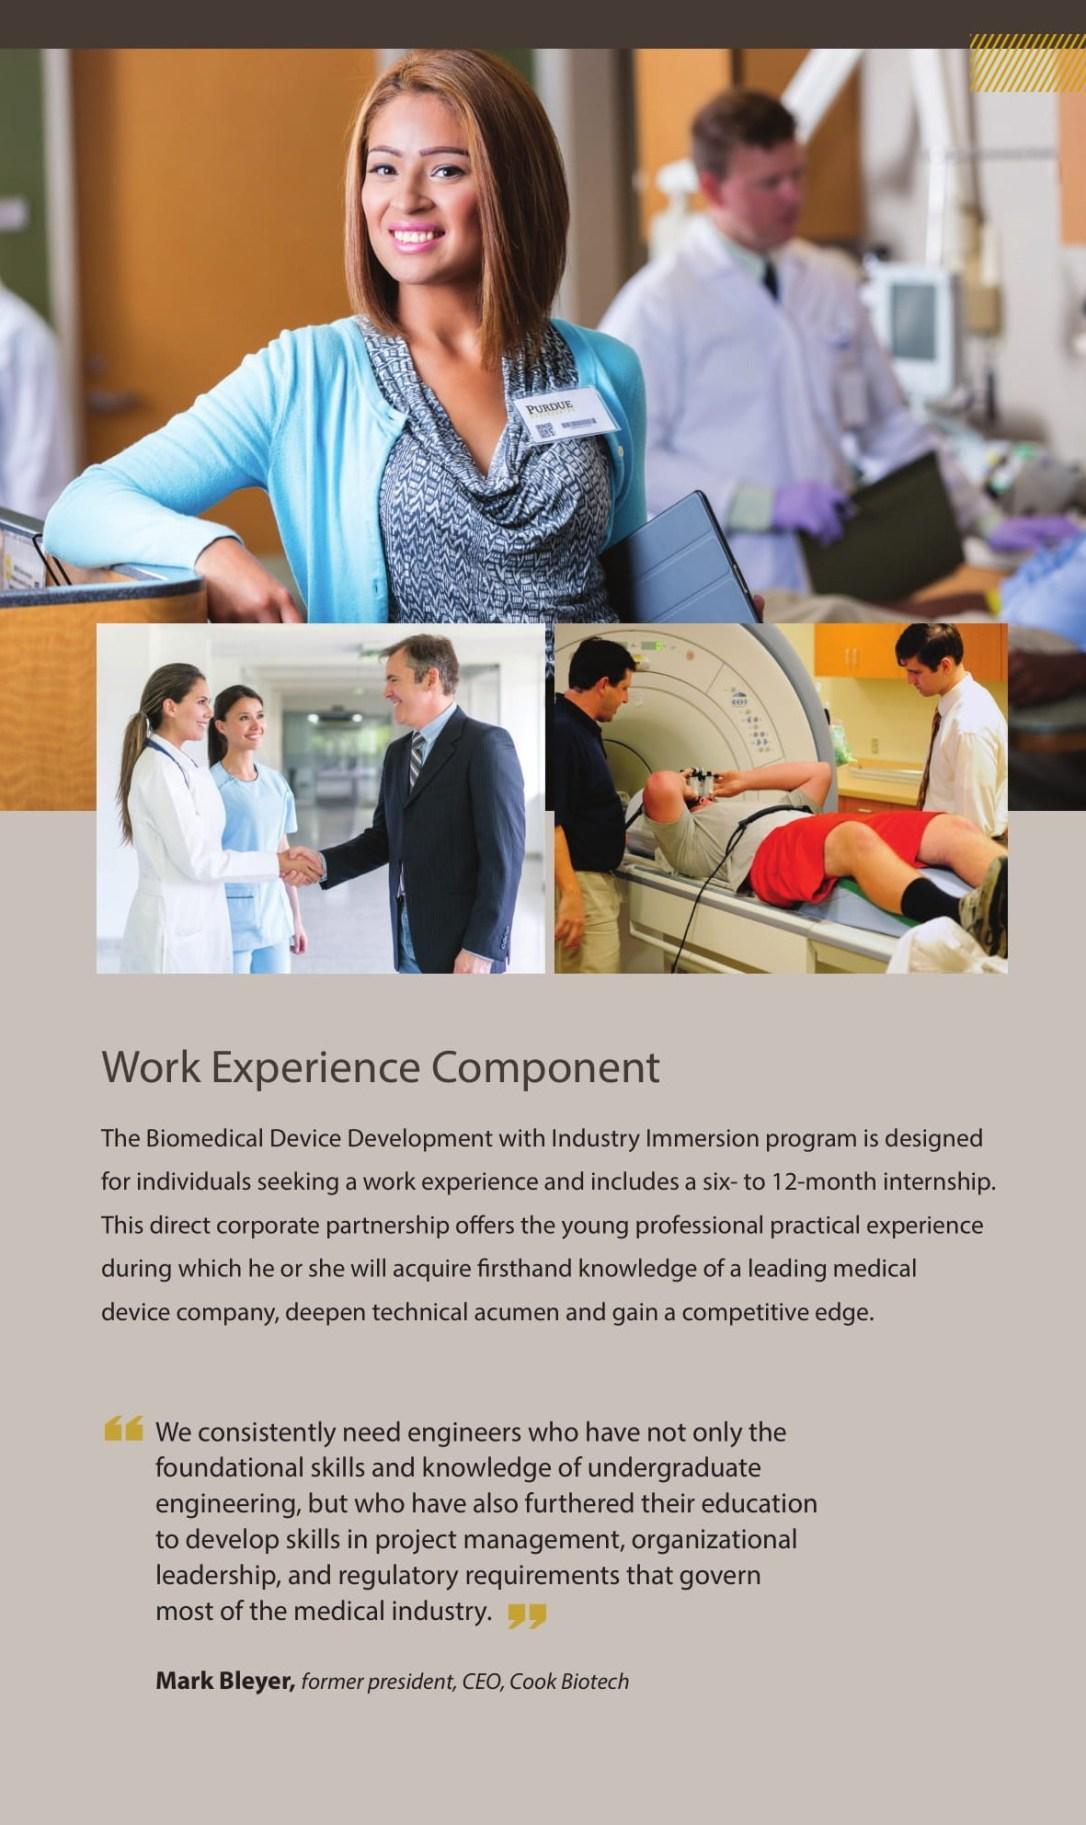 ENGS-18-11359 BME Masters Program Brochure SPLIT 05